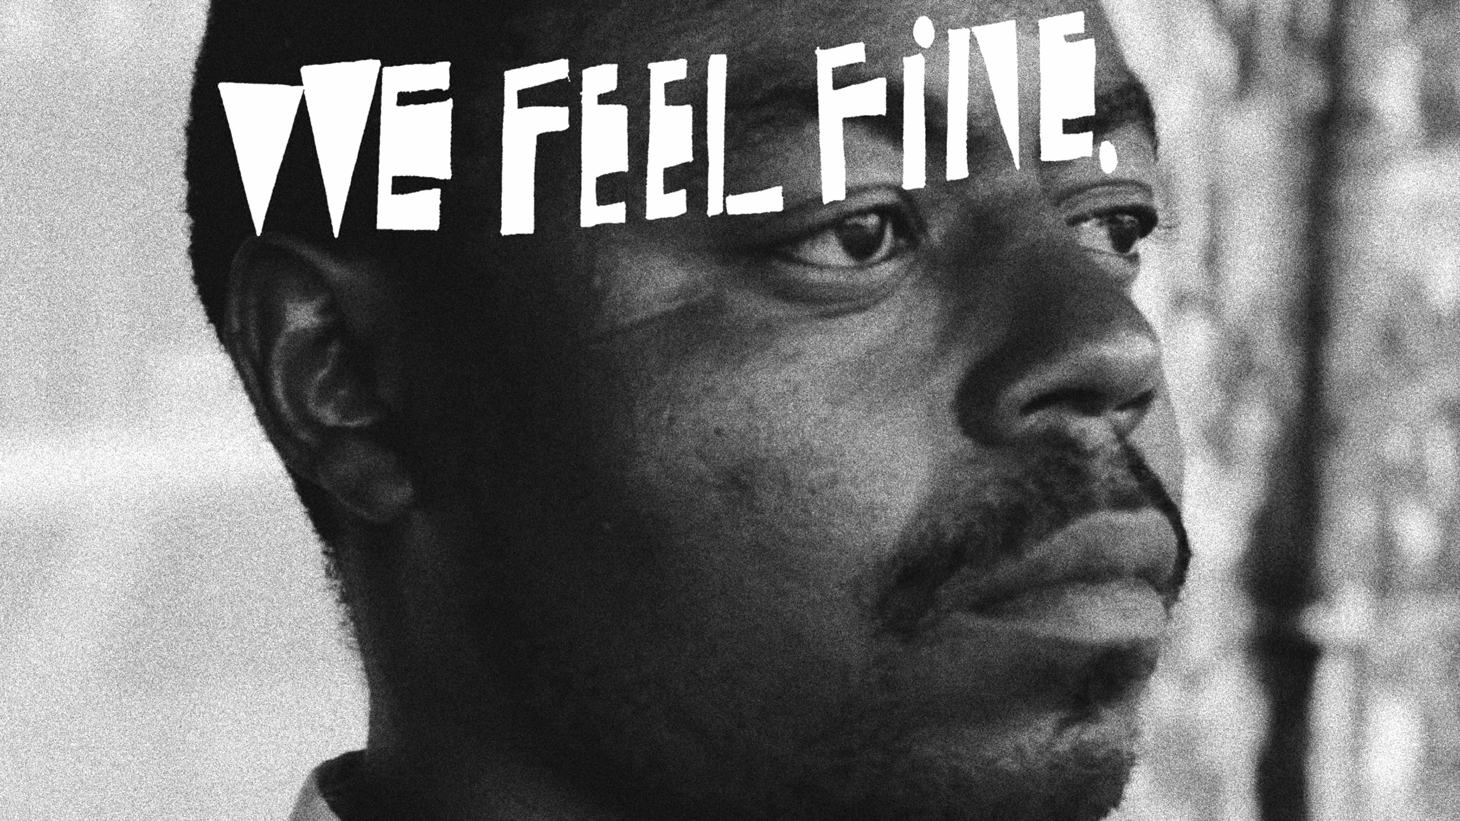 We Feel Fine